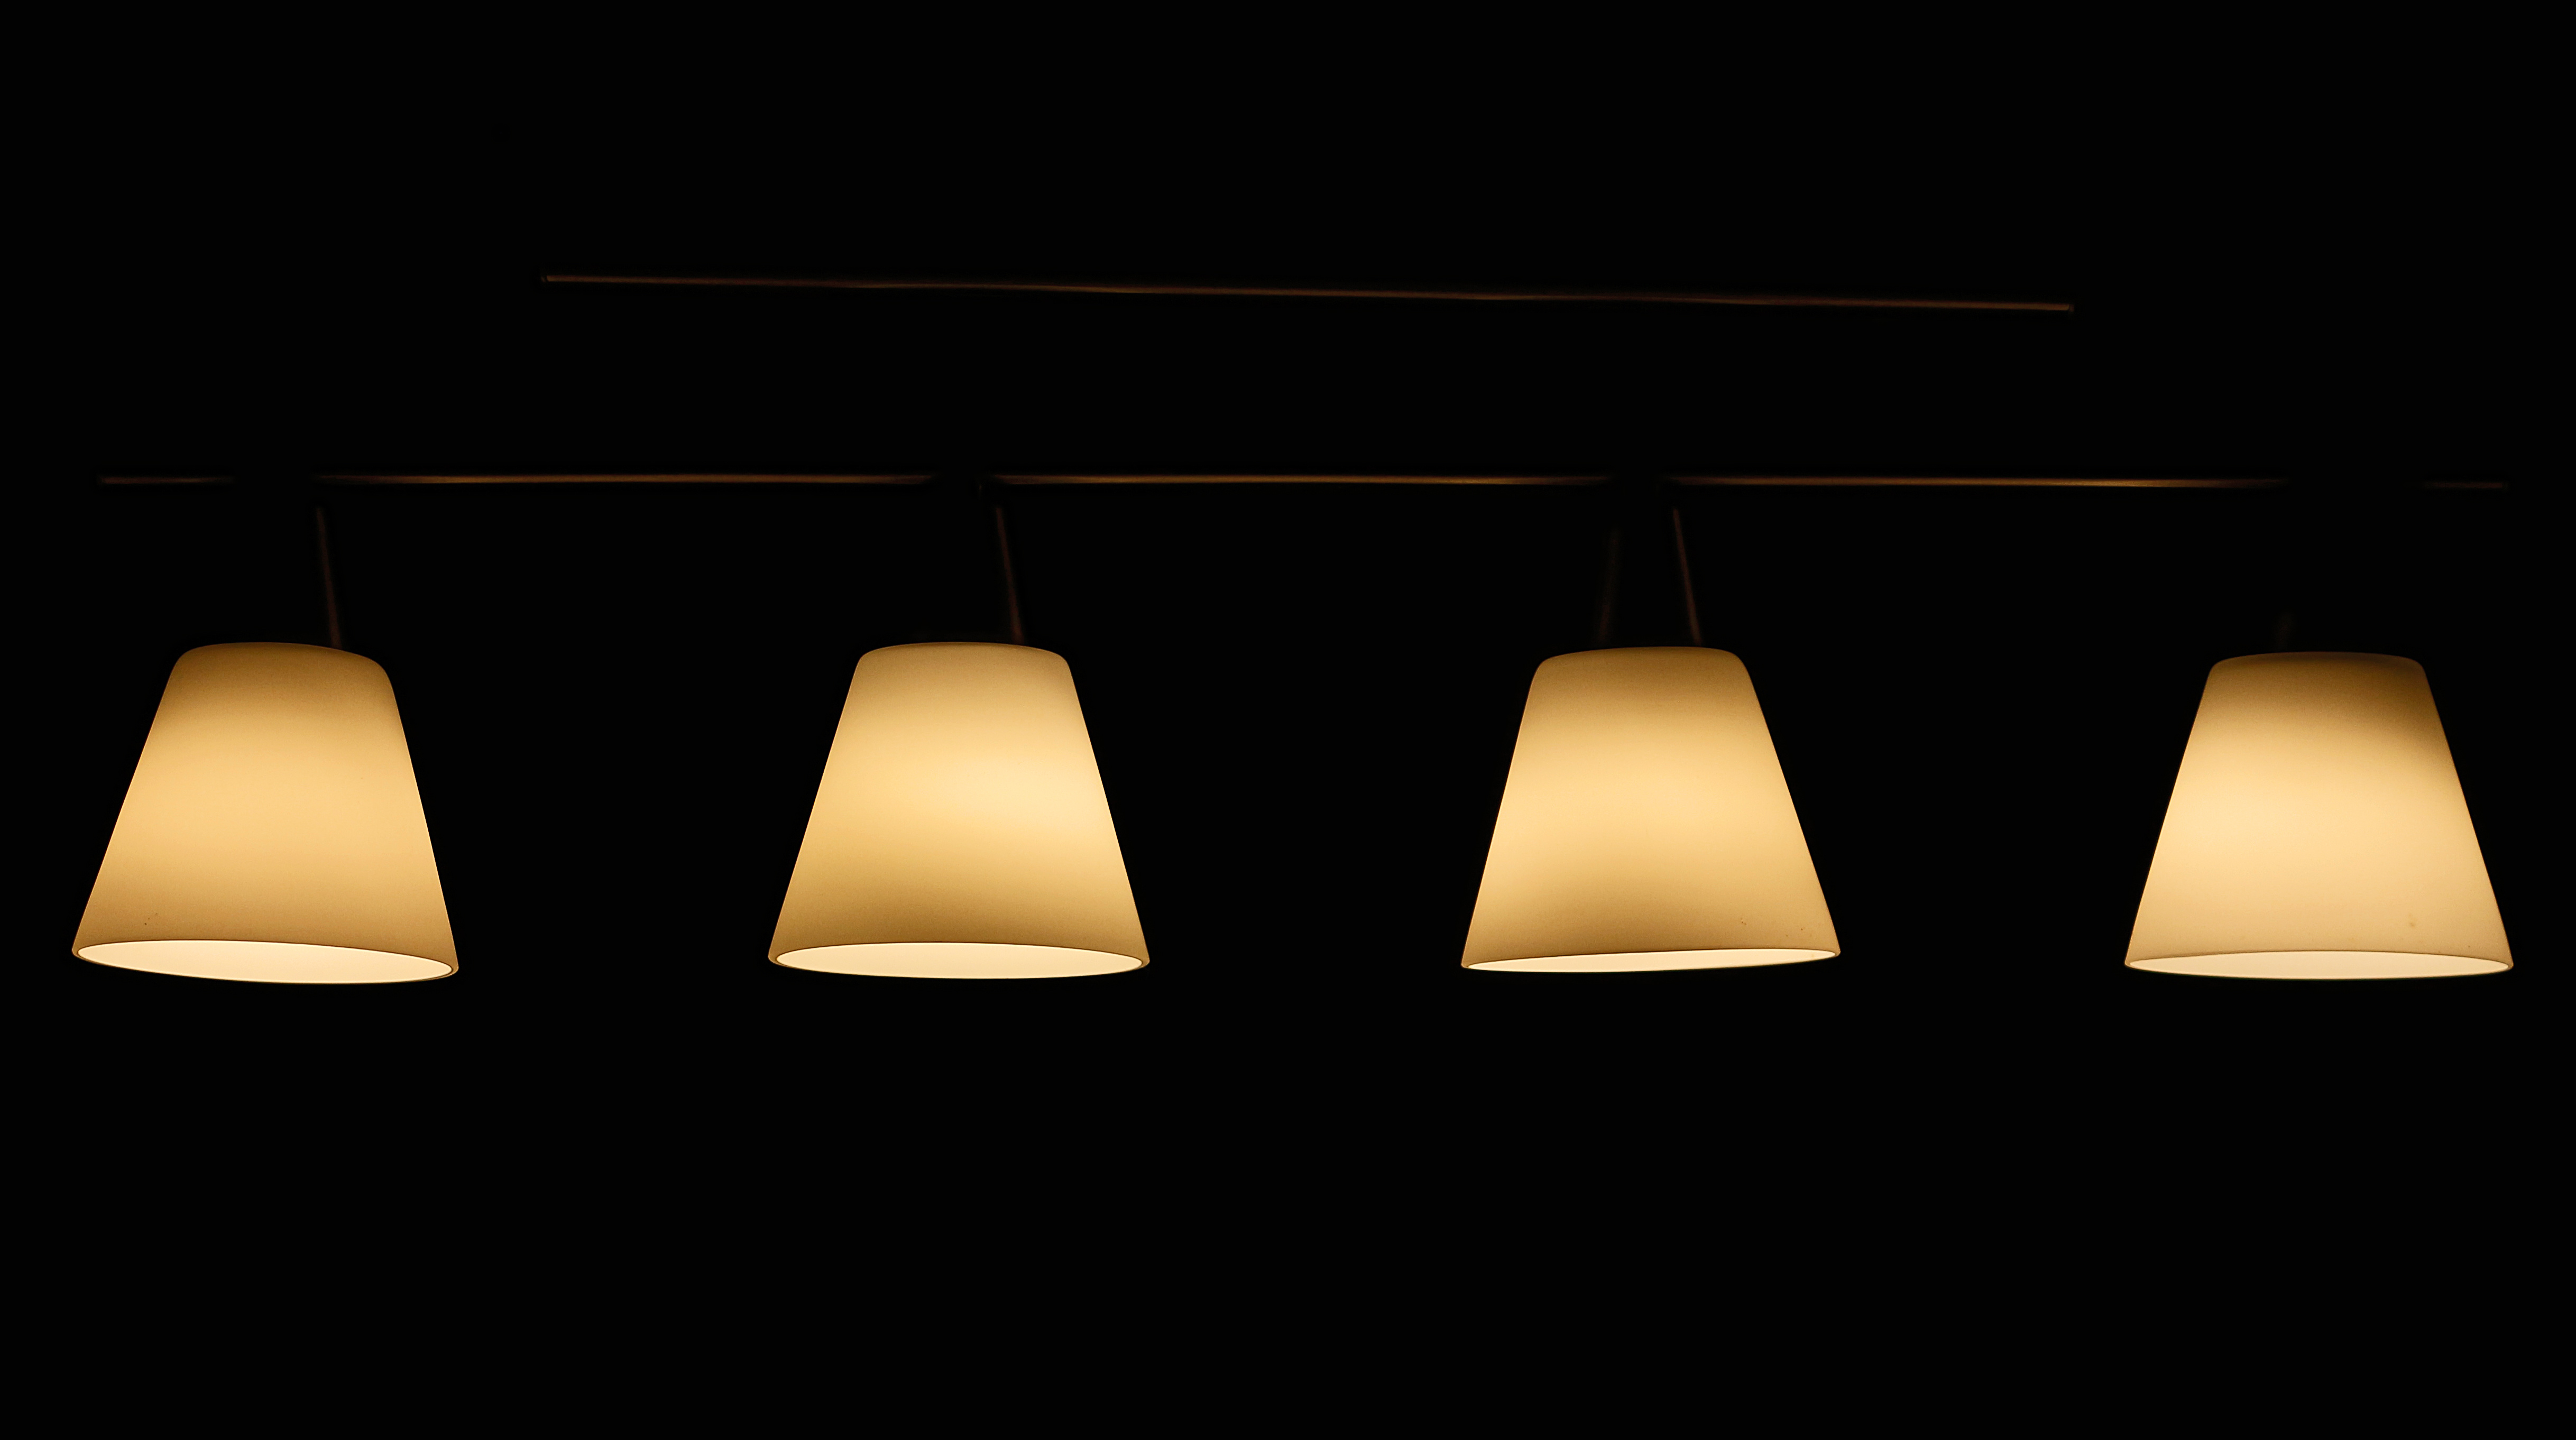 4 lampes abat jour abat jour agencement. Black Bedroom Furniture Sets. Home Design Ideas